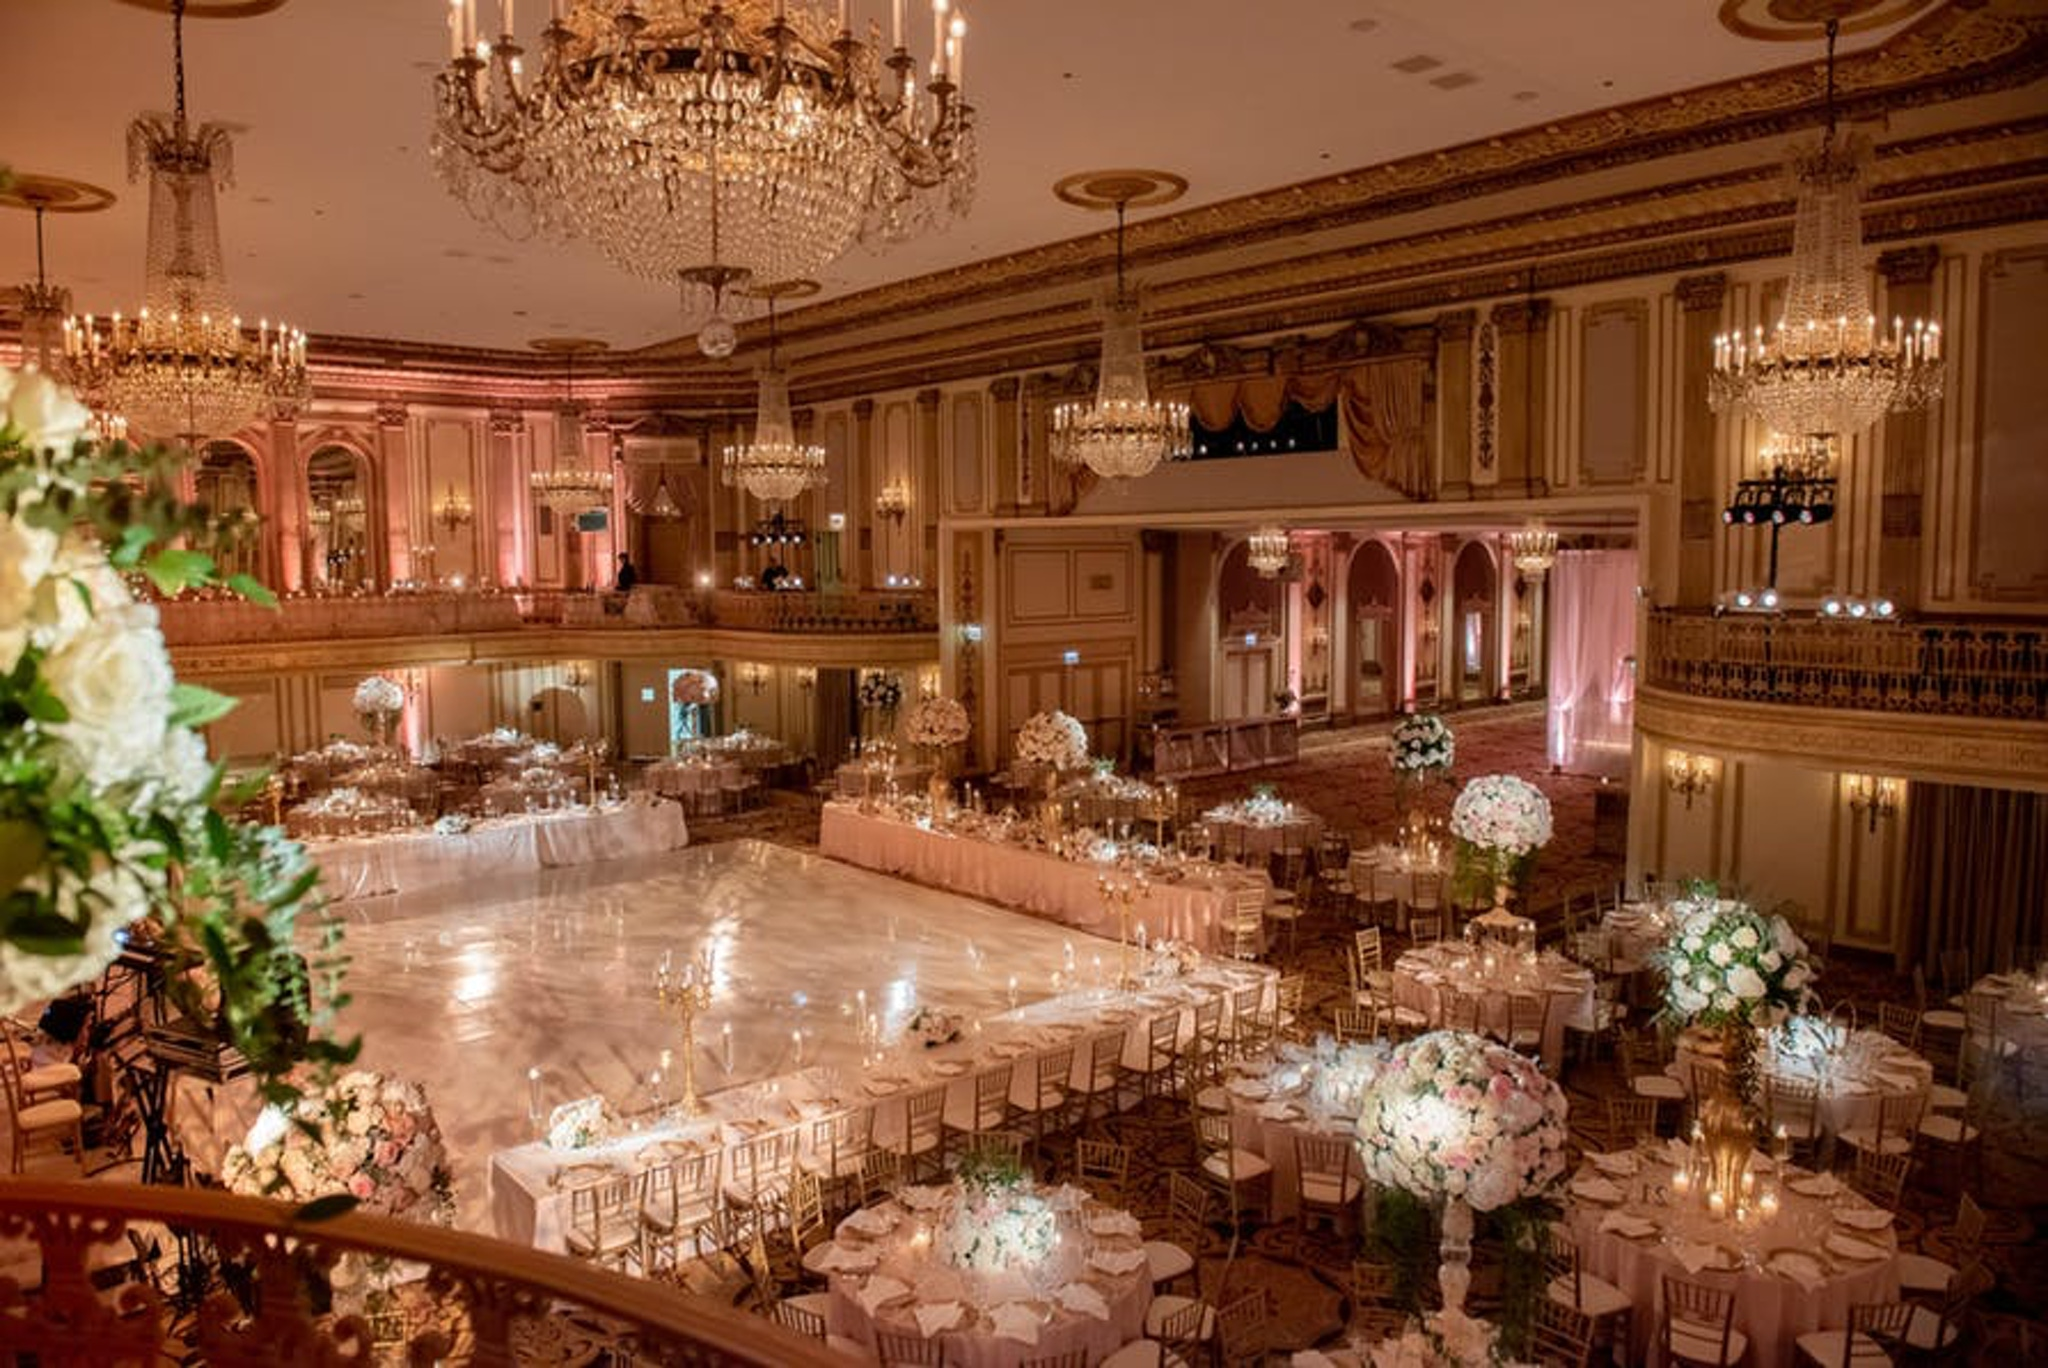 a massive ballroom with warm lighting